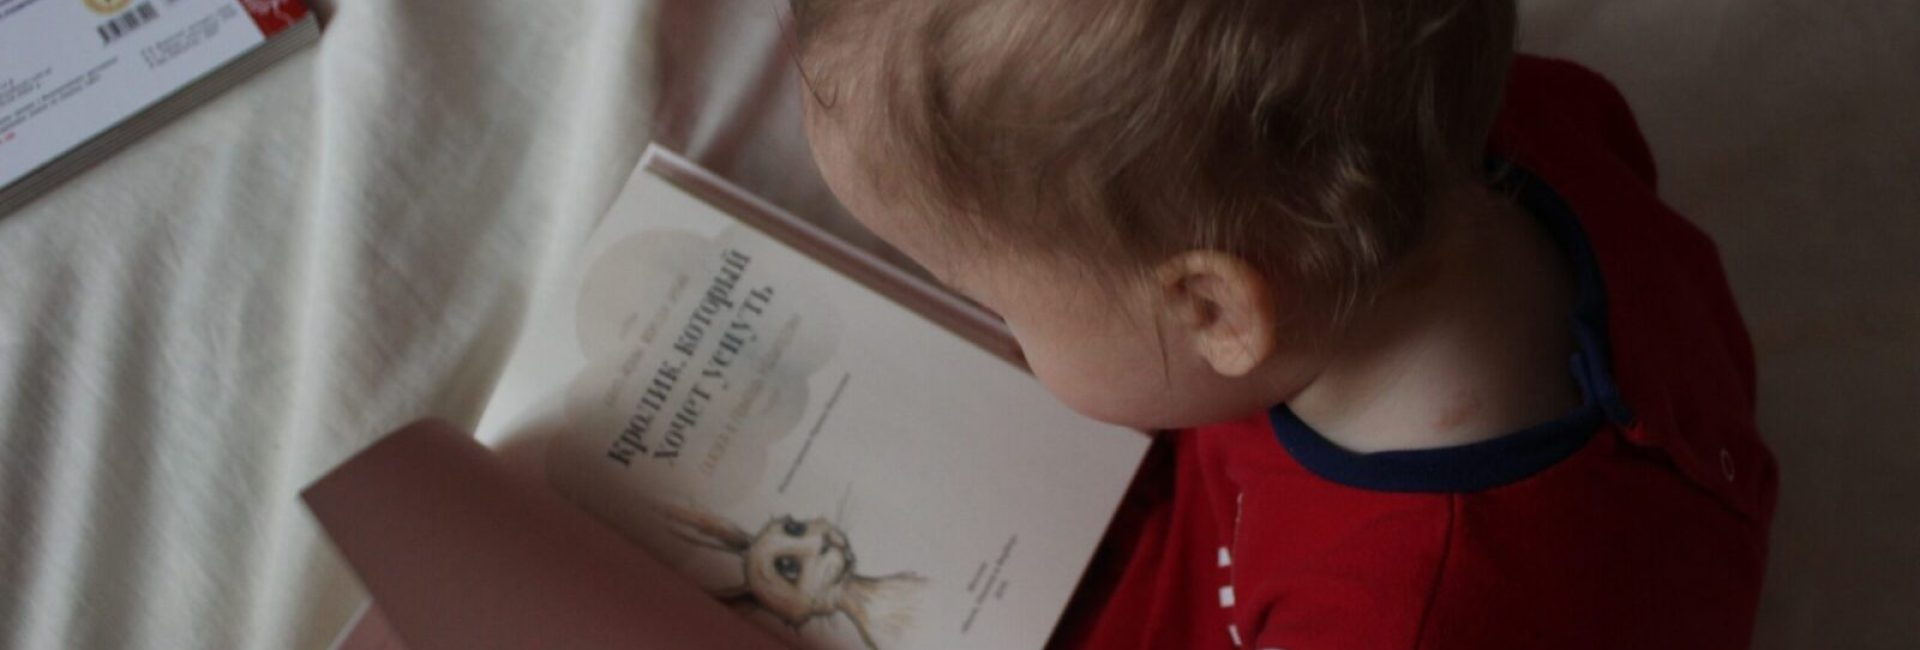 best bedtime books for babies